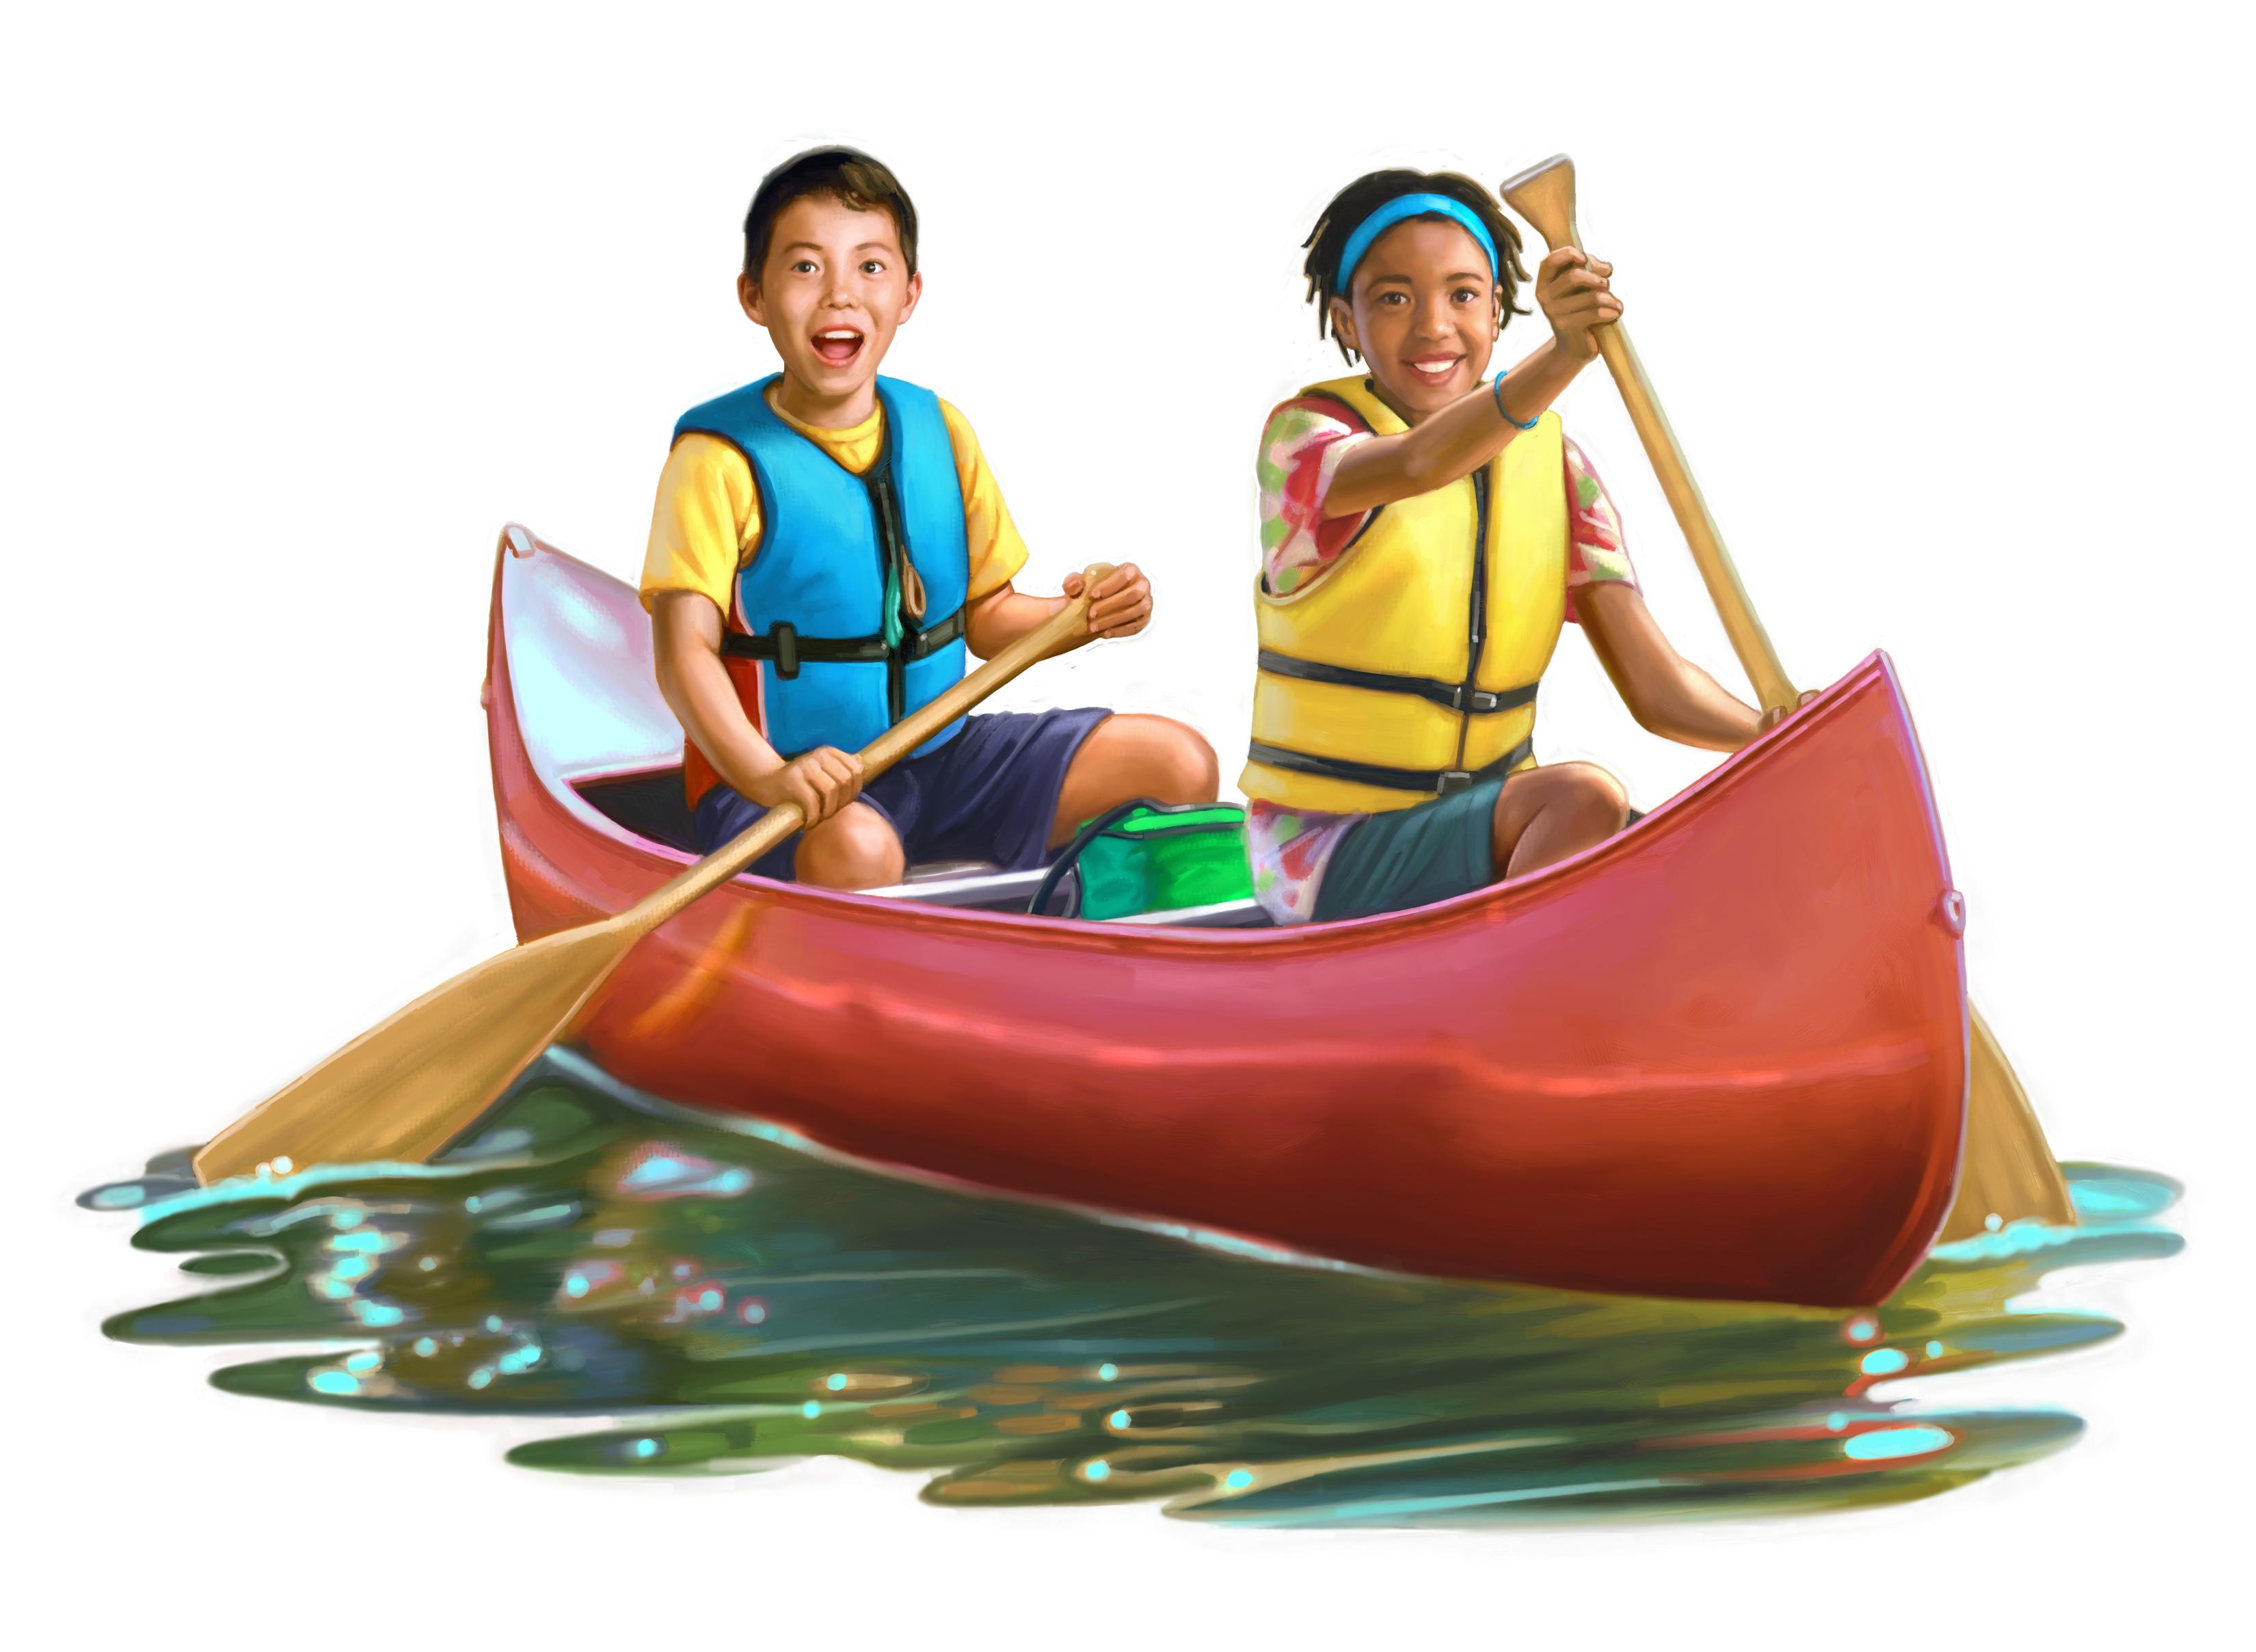 camp discovery clipart vignette canoe rockville bible church Christian Youth Camp Clip Art Summer Camp Clip Art